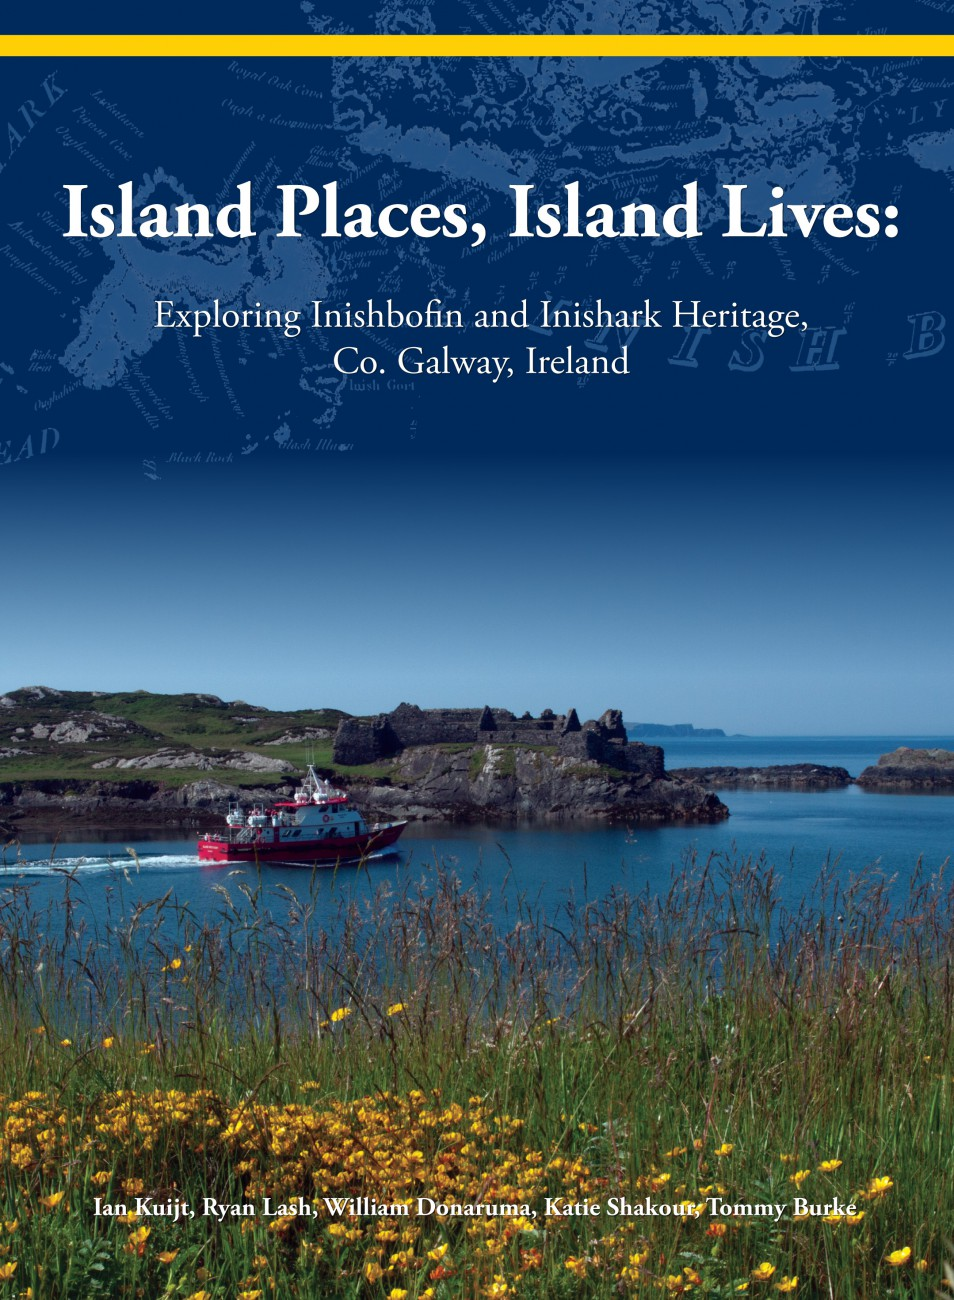 galway ireland sites